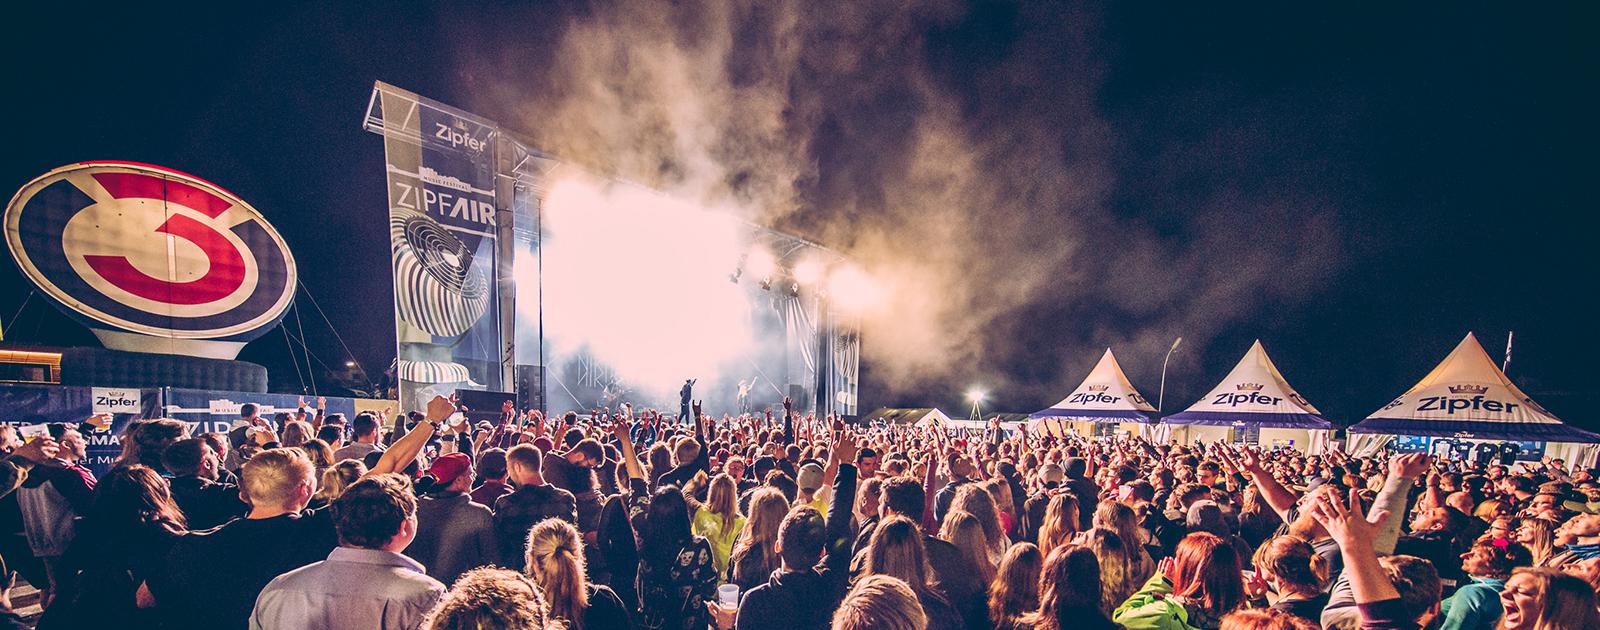 ZipfAir Music Festival 2020 am 5. June 2020 @ Zipfer Brauerei.